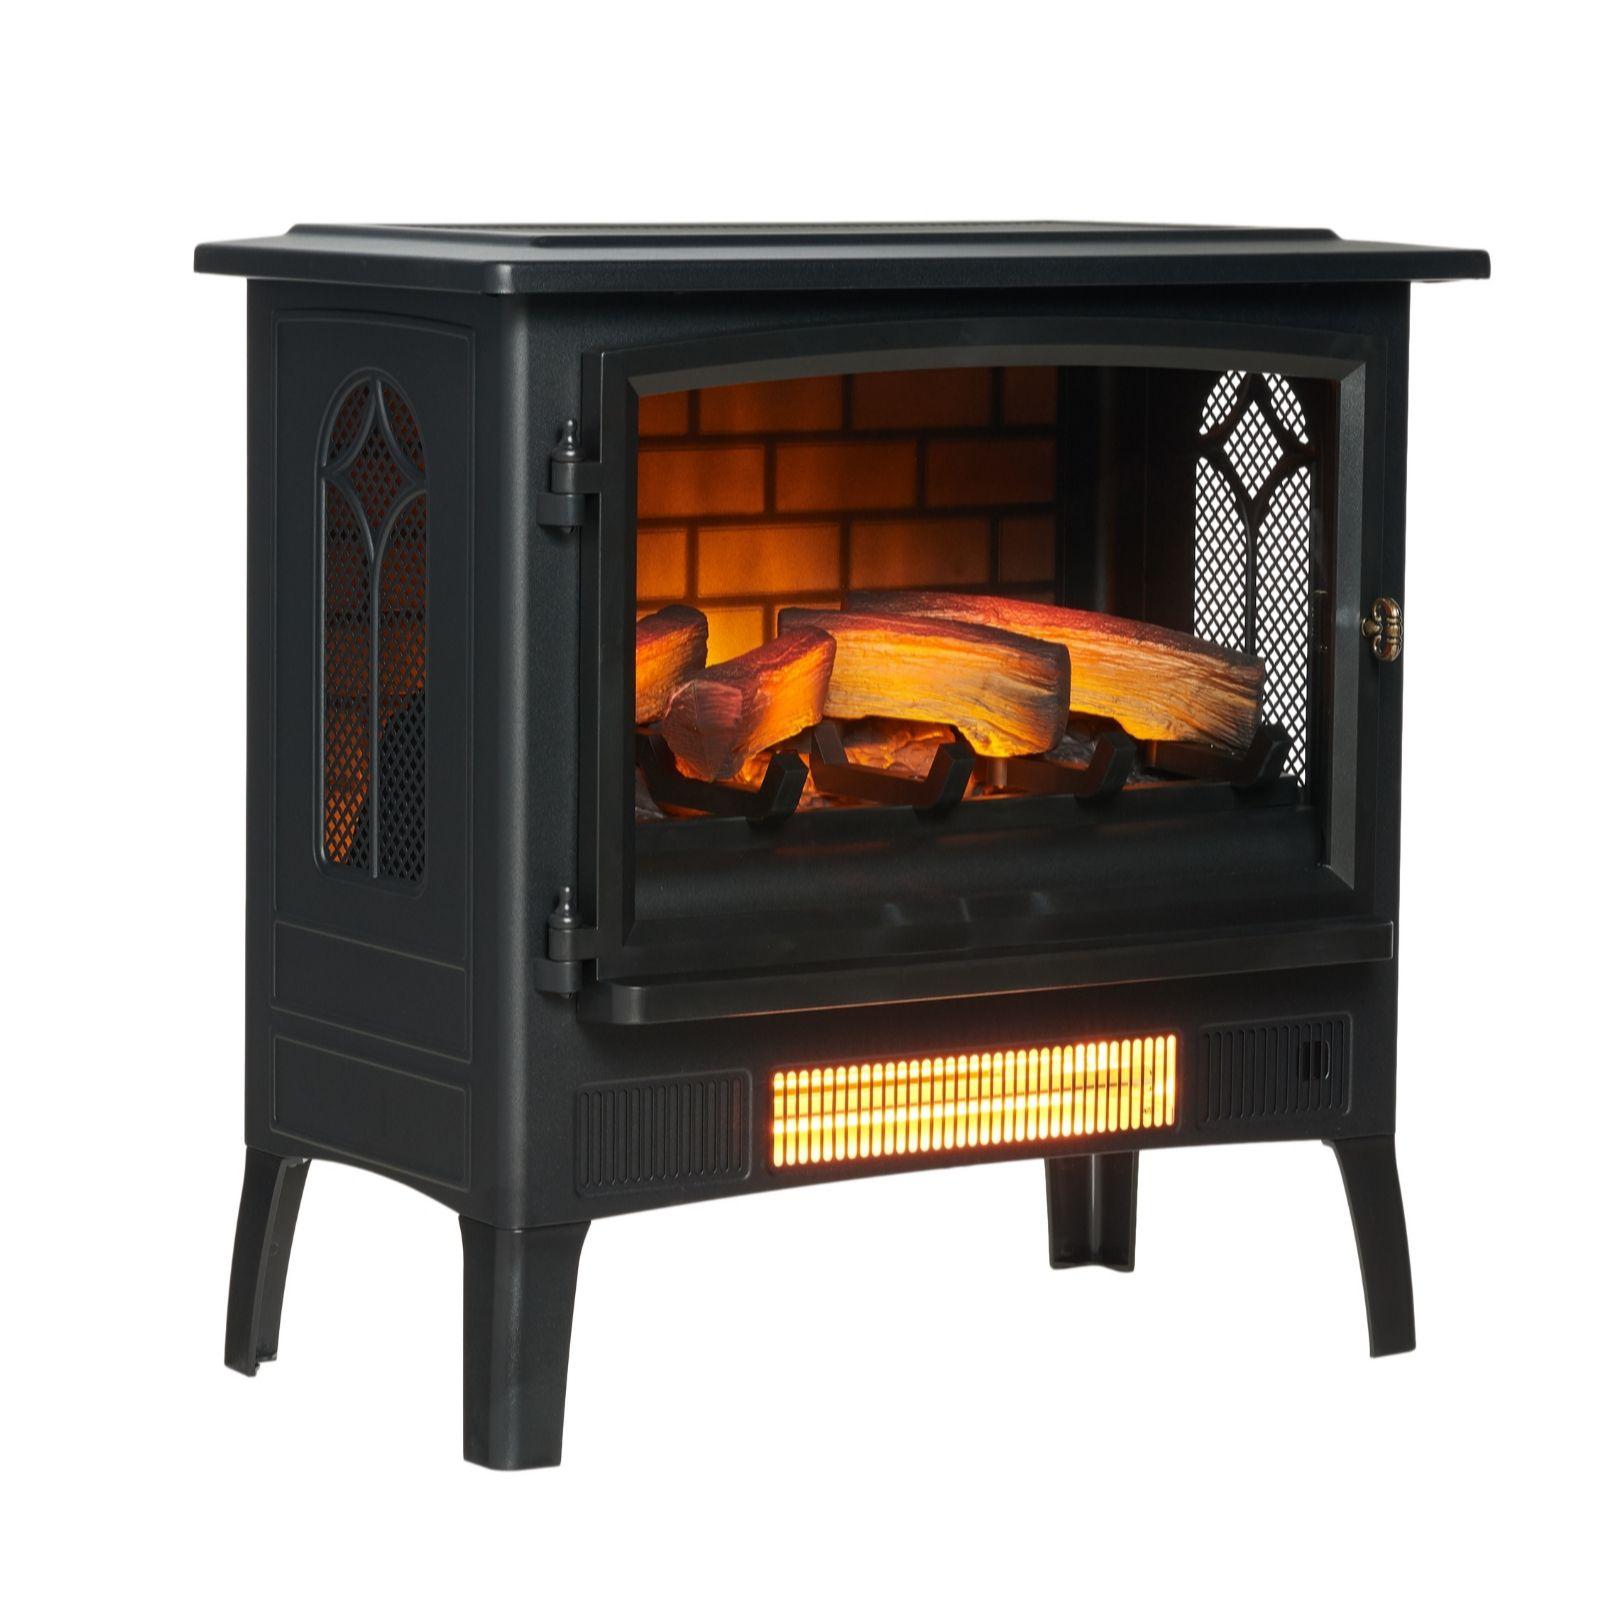 Powerheat Log Burner Style Infragen Heater W 3d Flame Effect